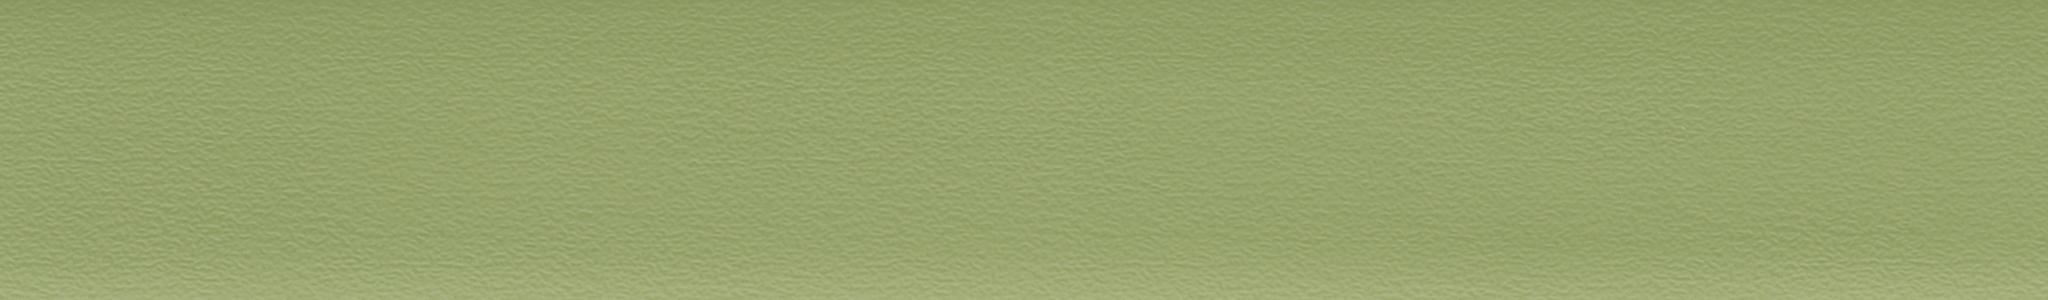 HU 16612 ABS hrana zelená perla 101